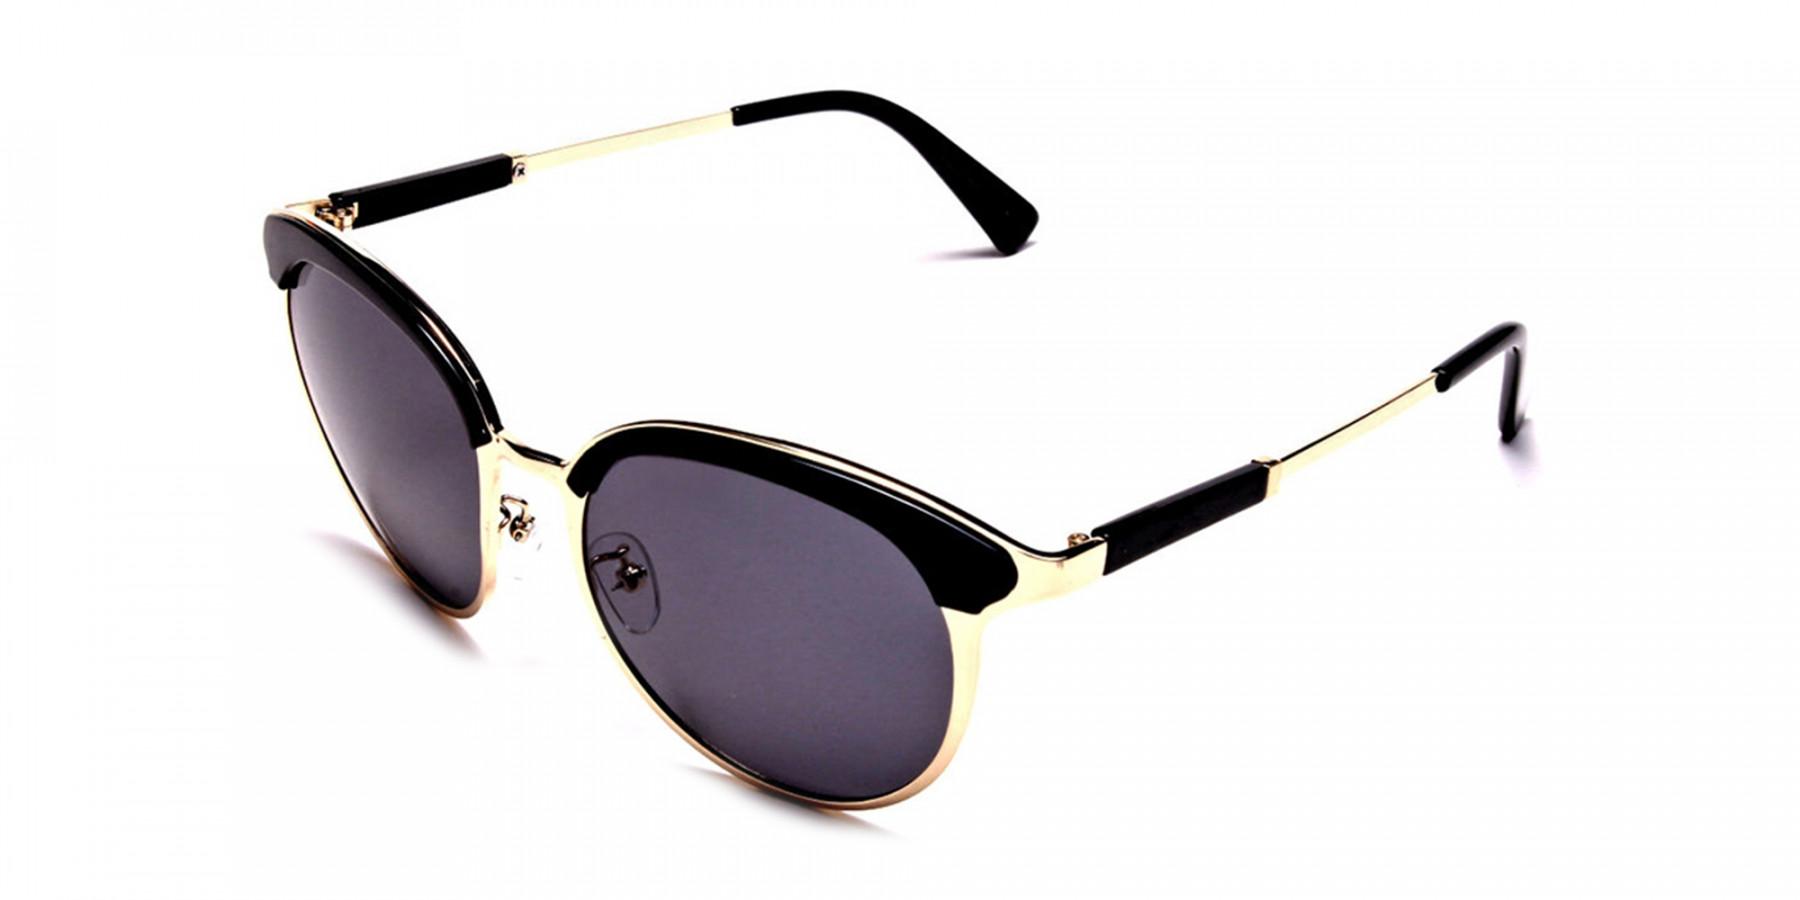 GOLD ROUND Sunglasses -2